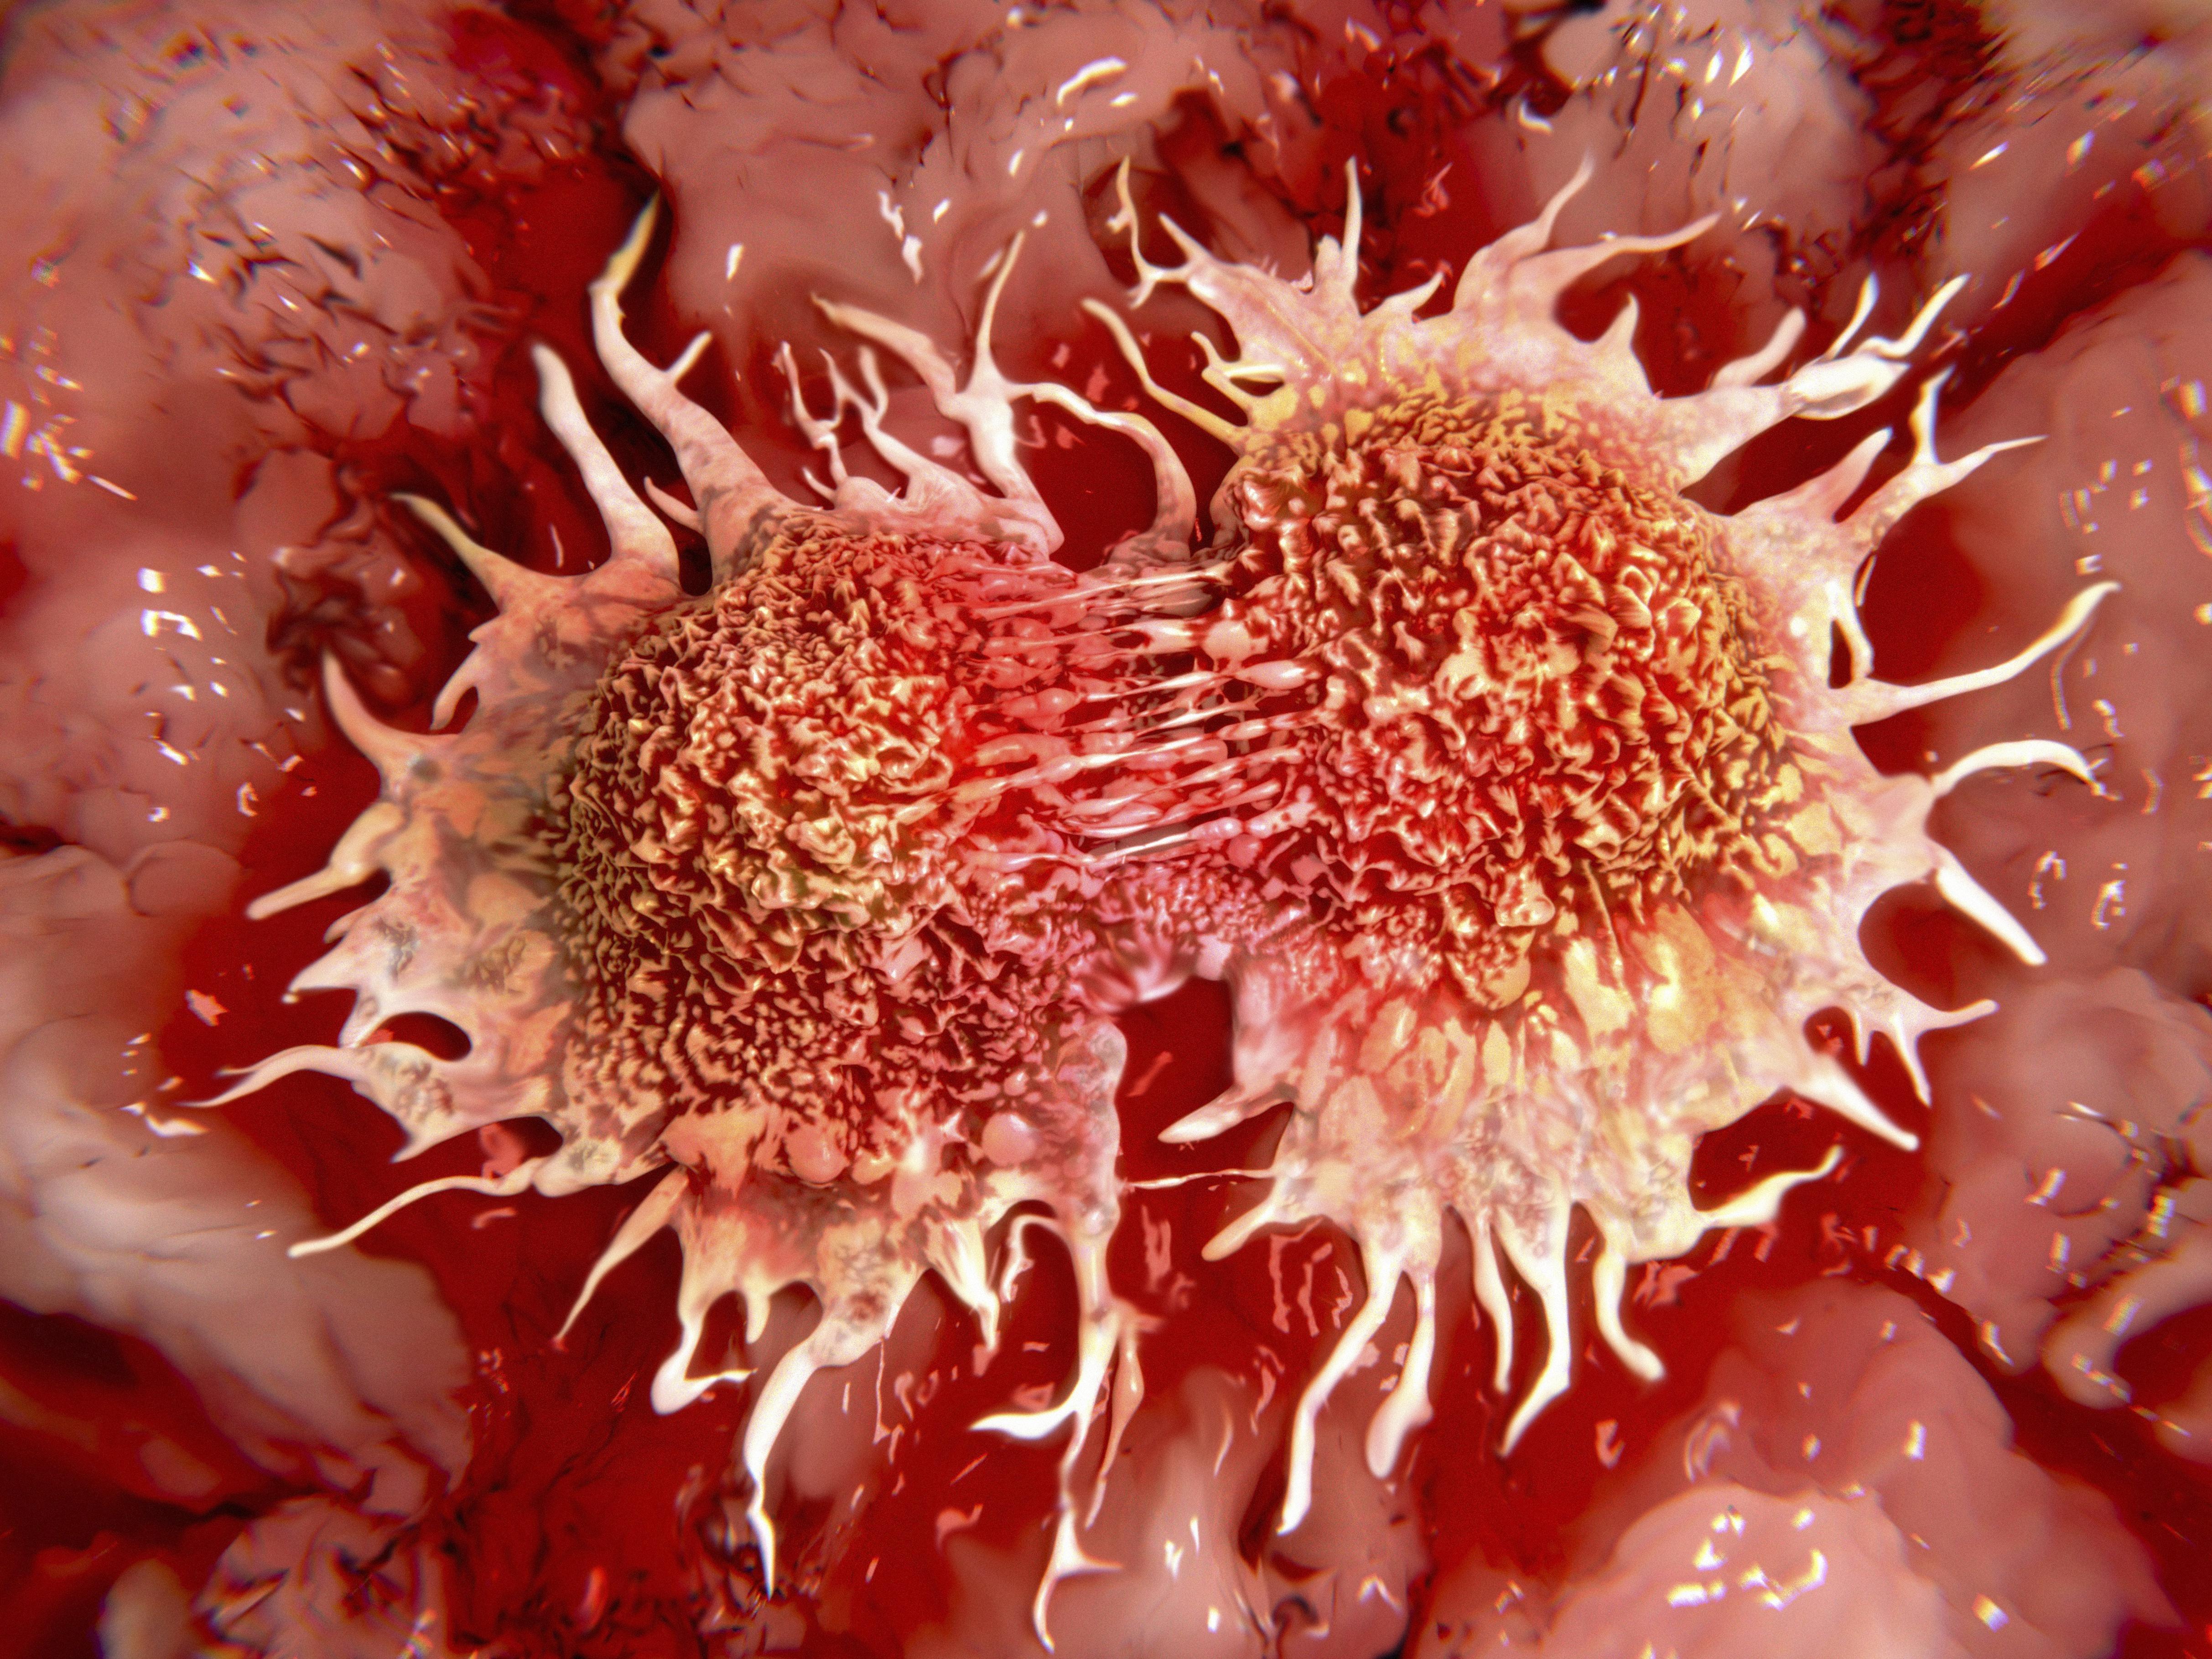 Illustration of cancer cells in middle of dividing